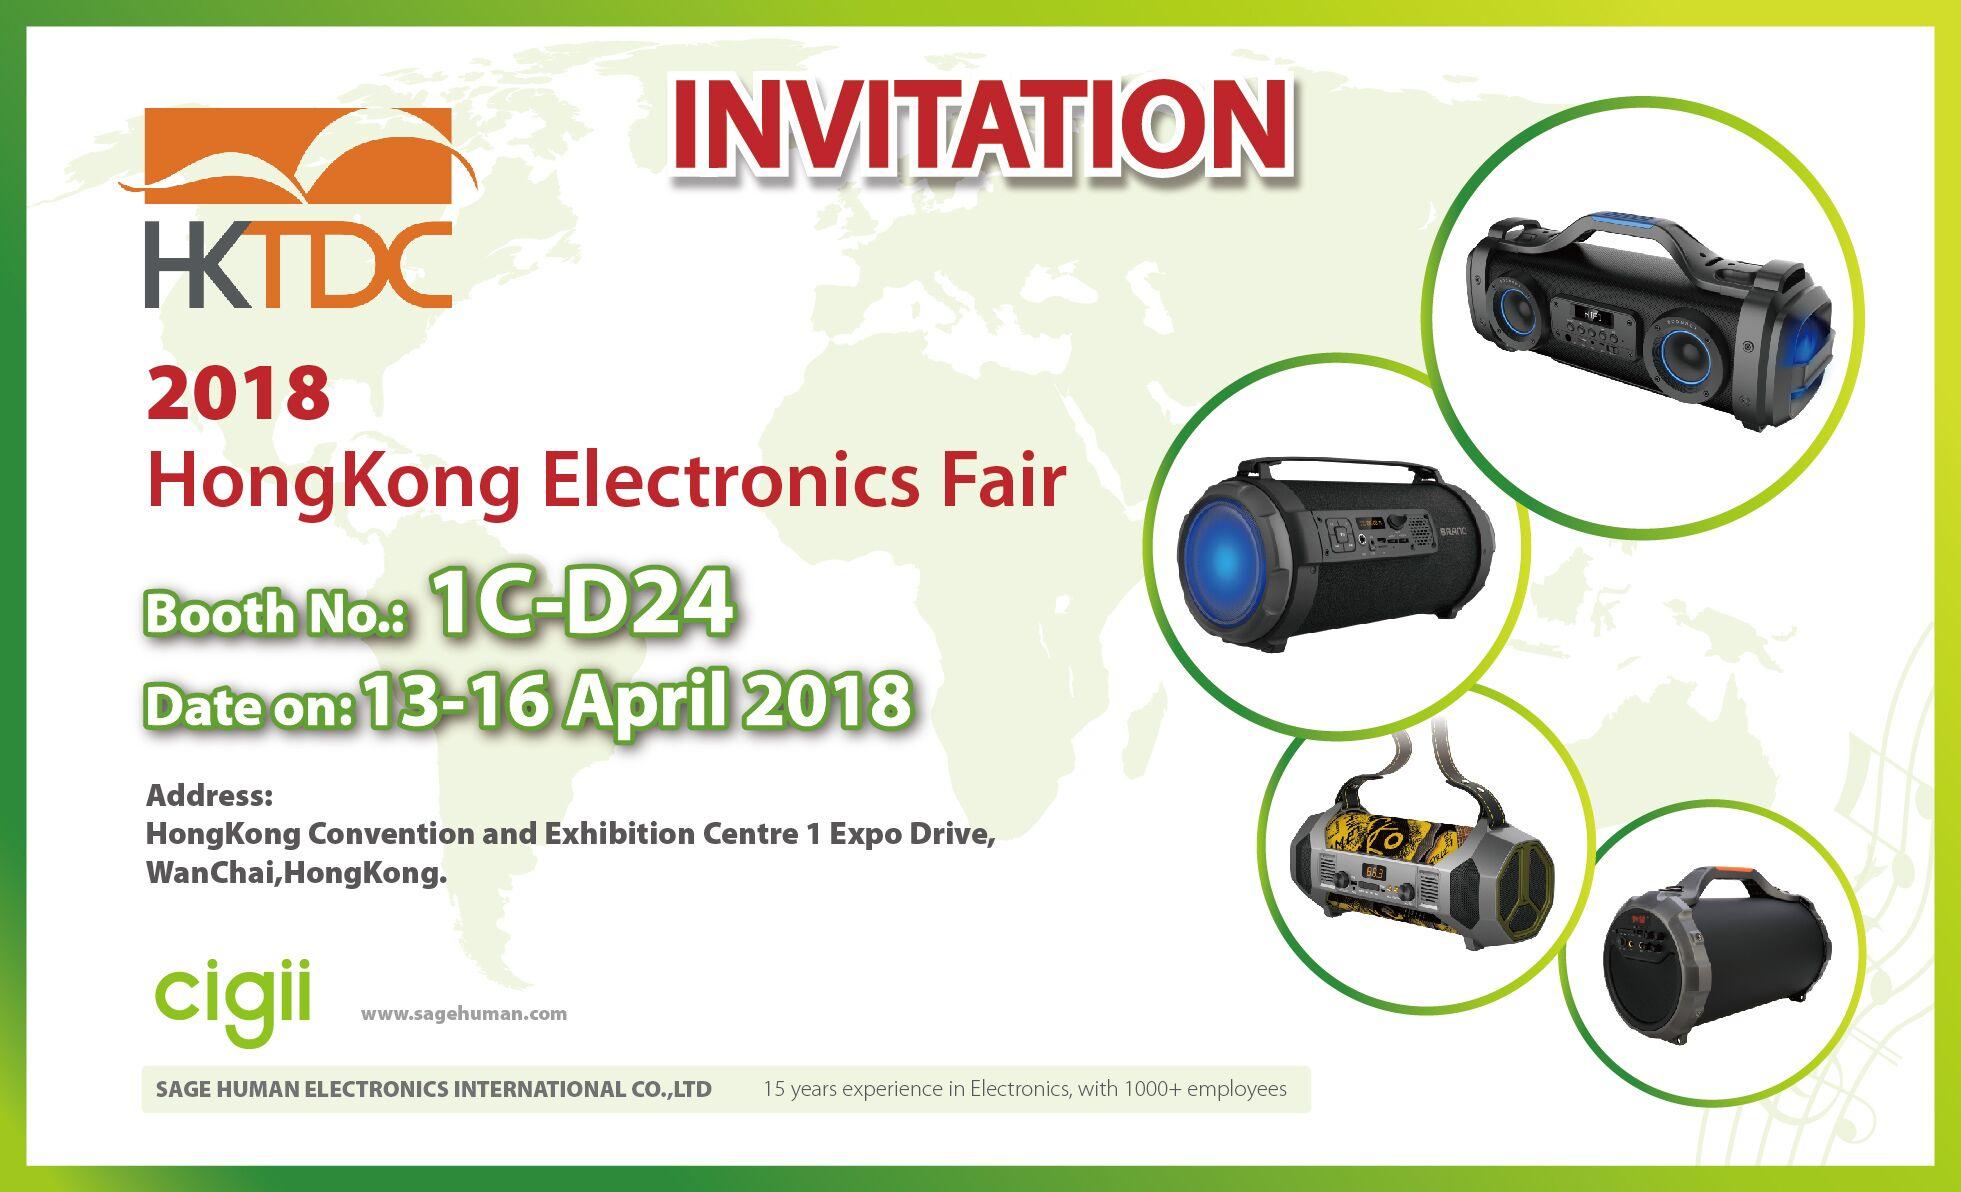 SAGE SPEAKER HKTDC INVITATION.jpg